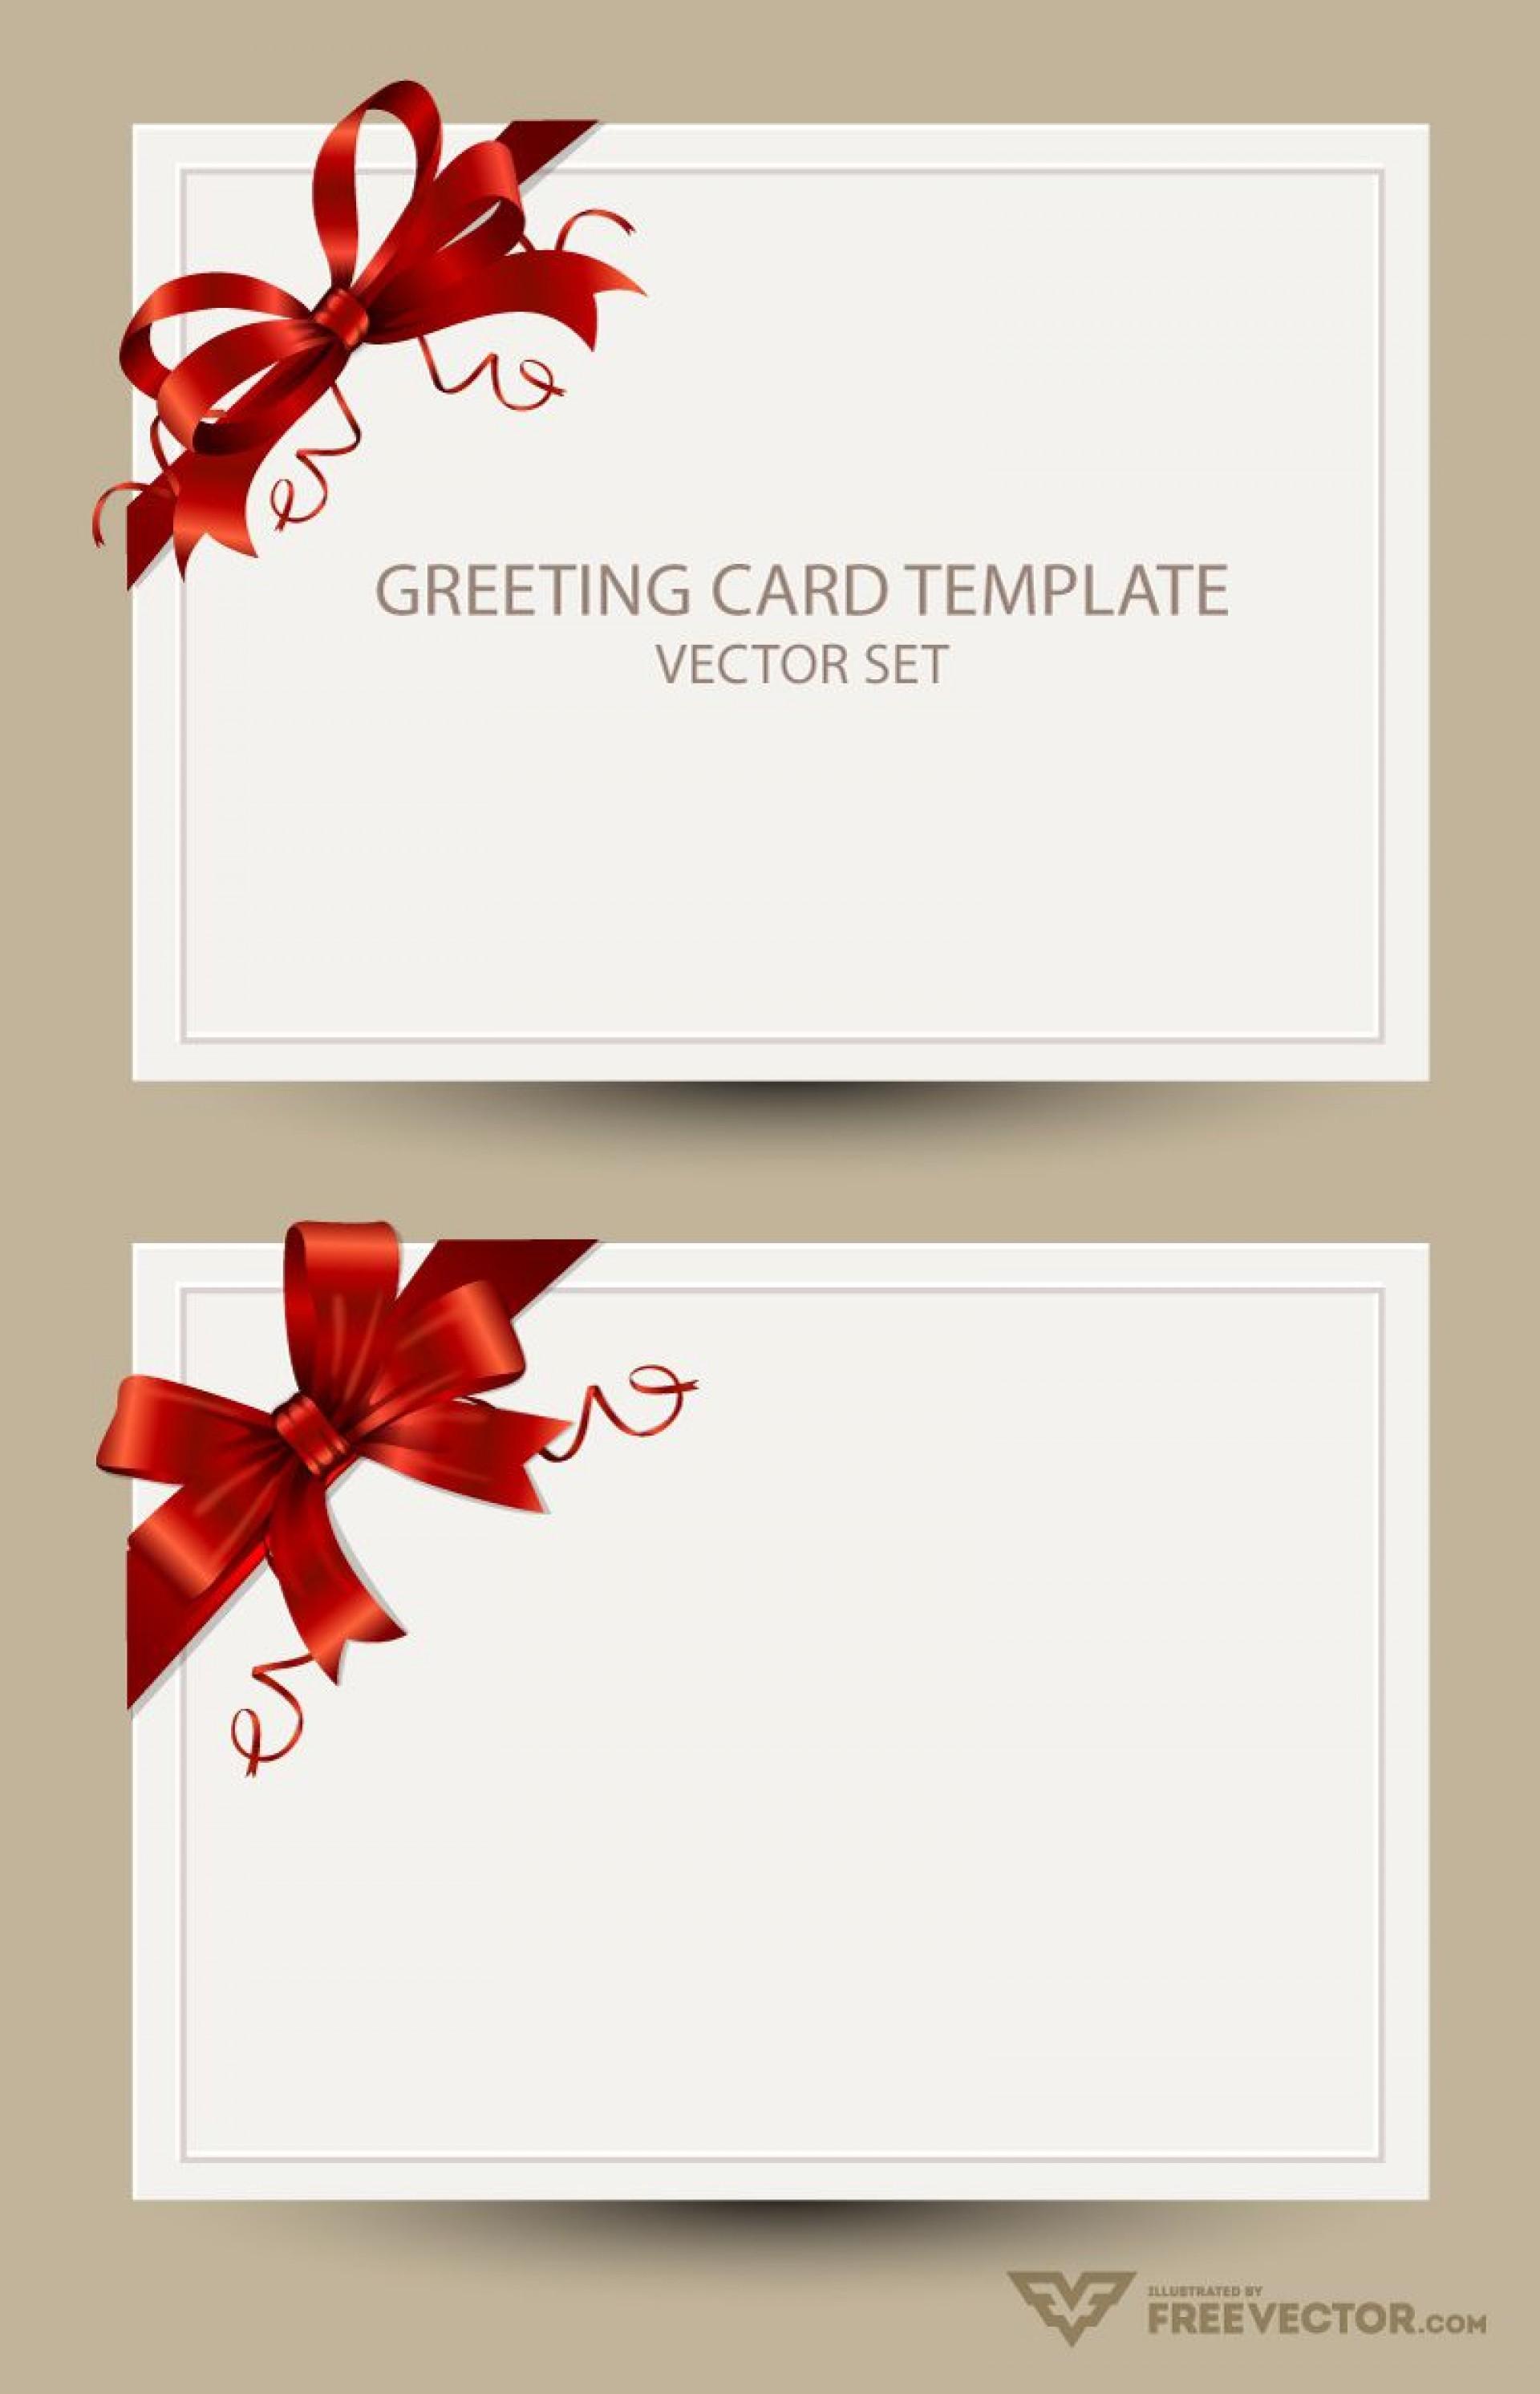 002 Rare Printable Greeting Card Template Image  Templates Print Free Birthday1920